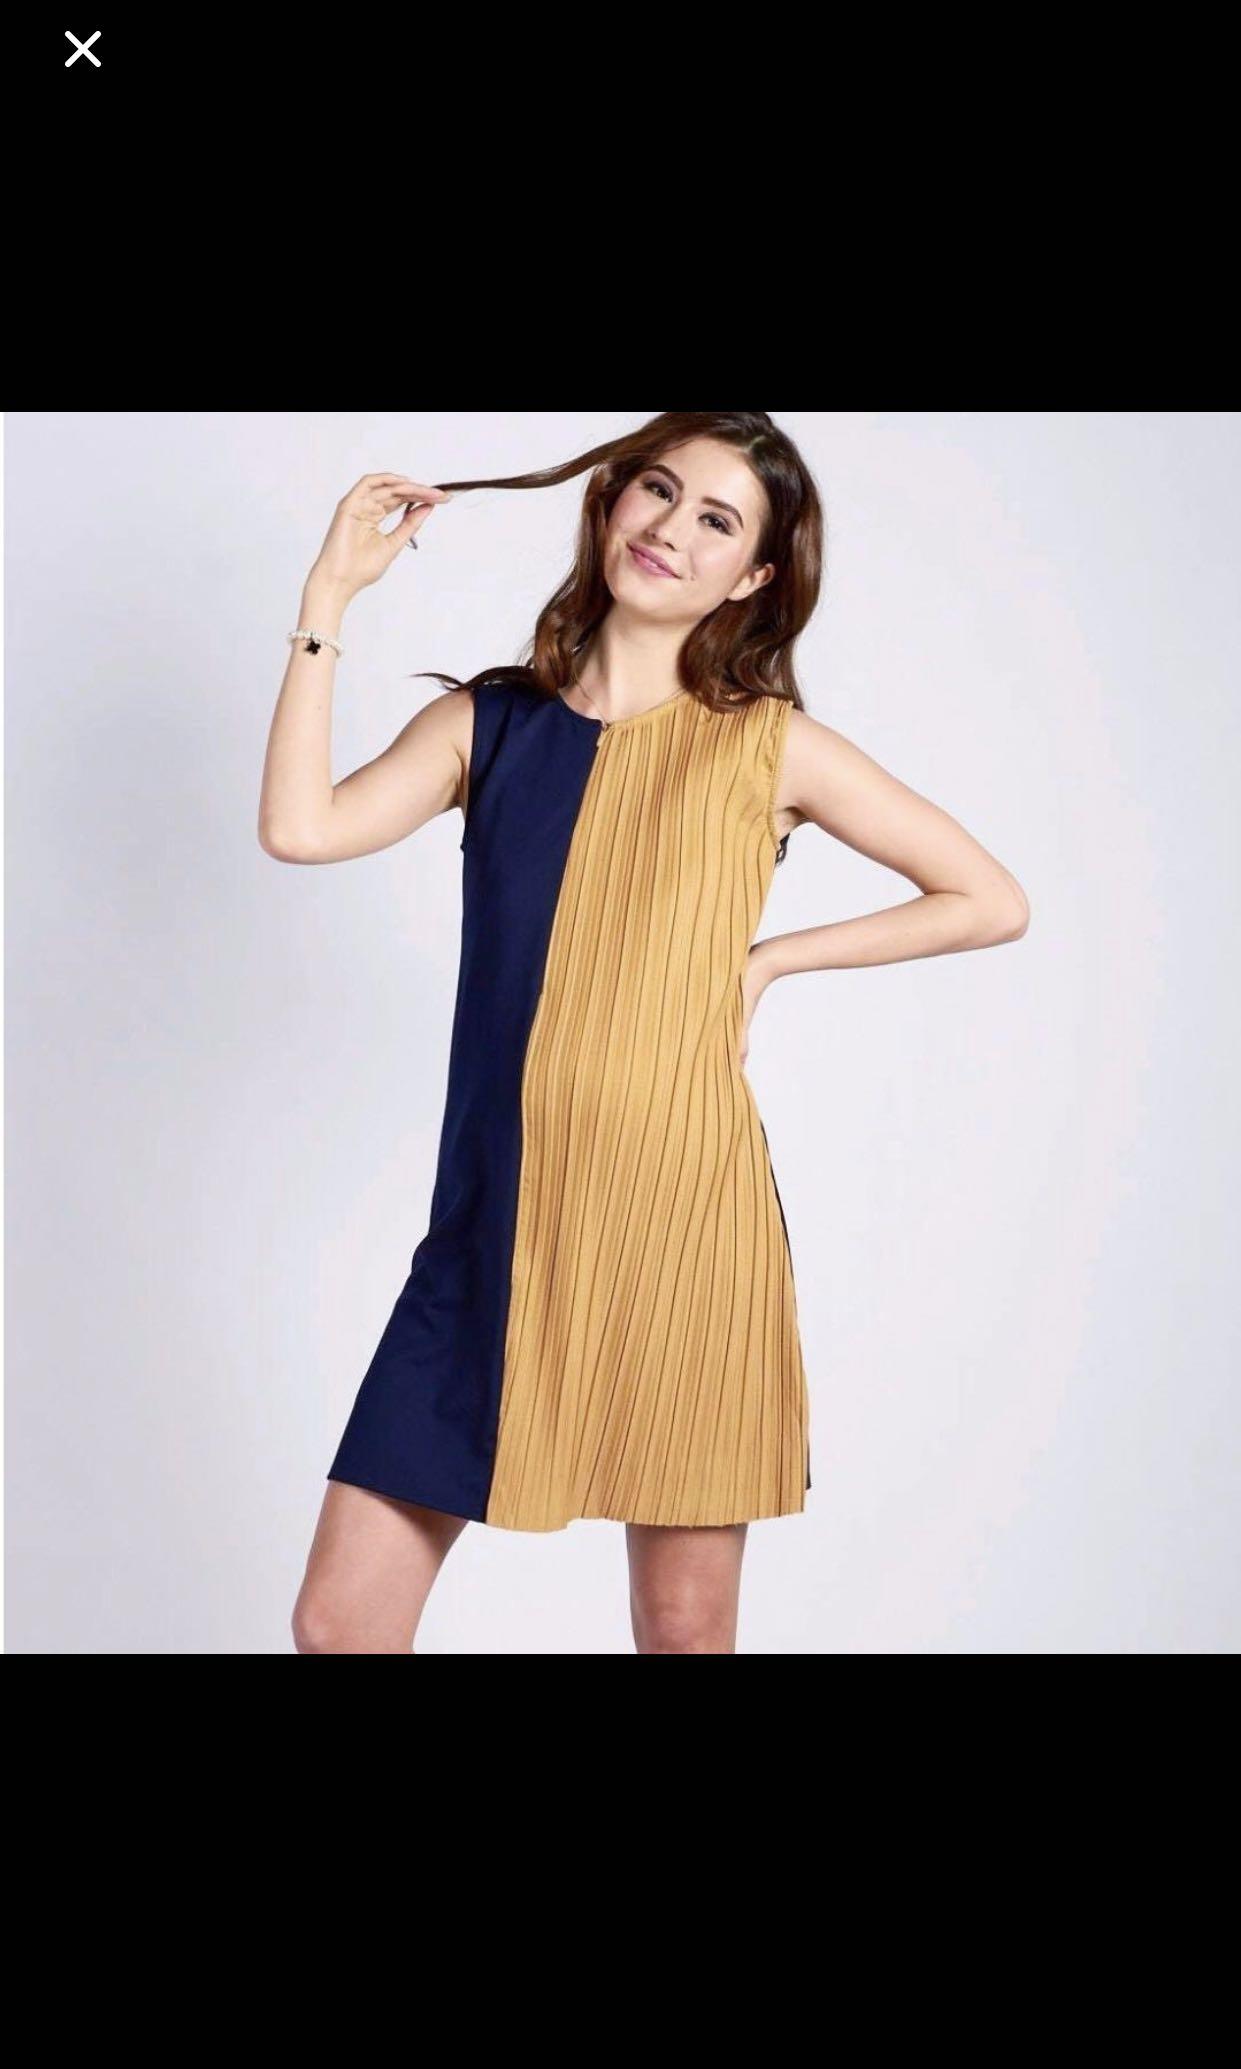 e0271ffbe28187 JEC navy sleeveless half pleat nursing dress